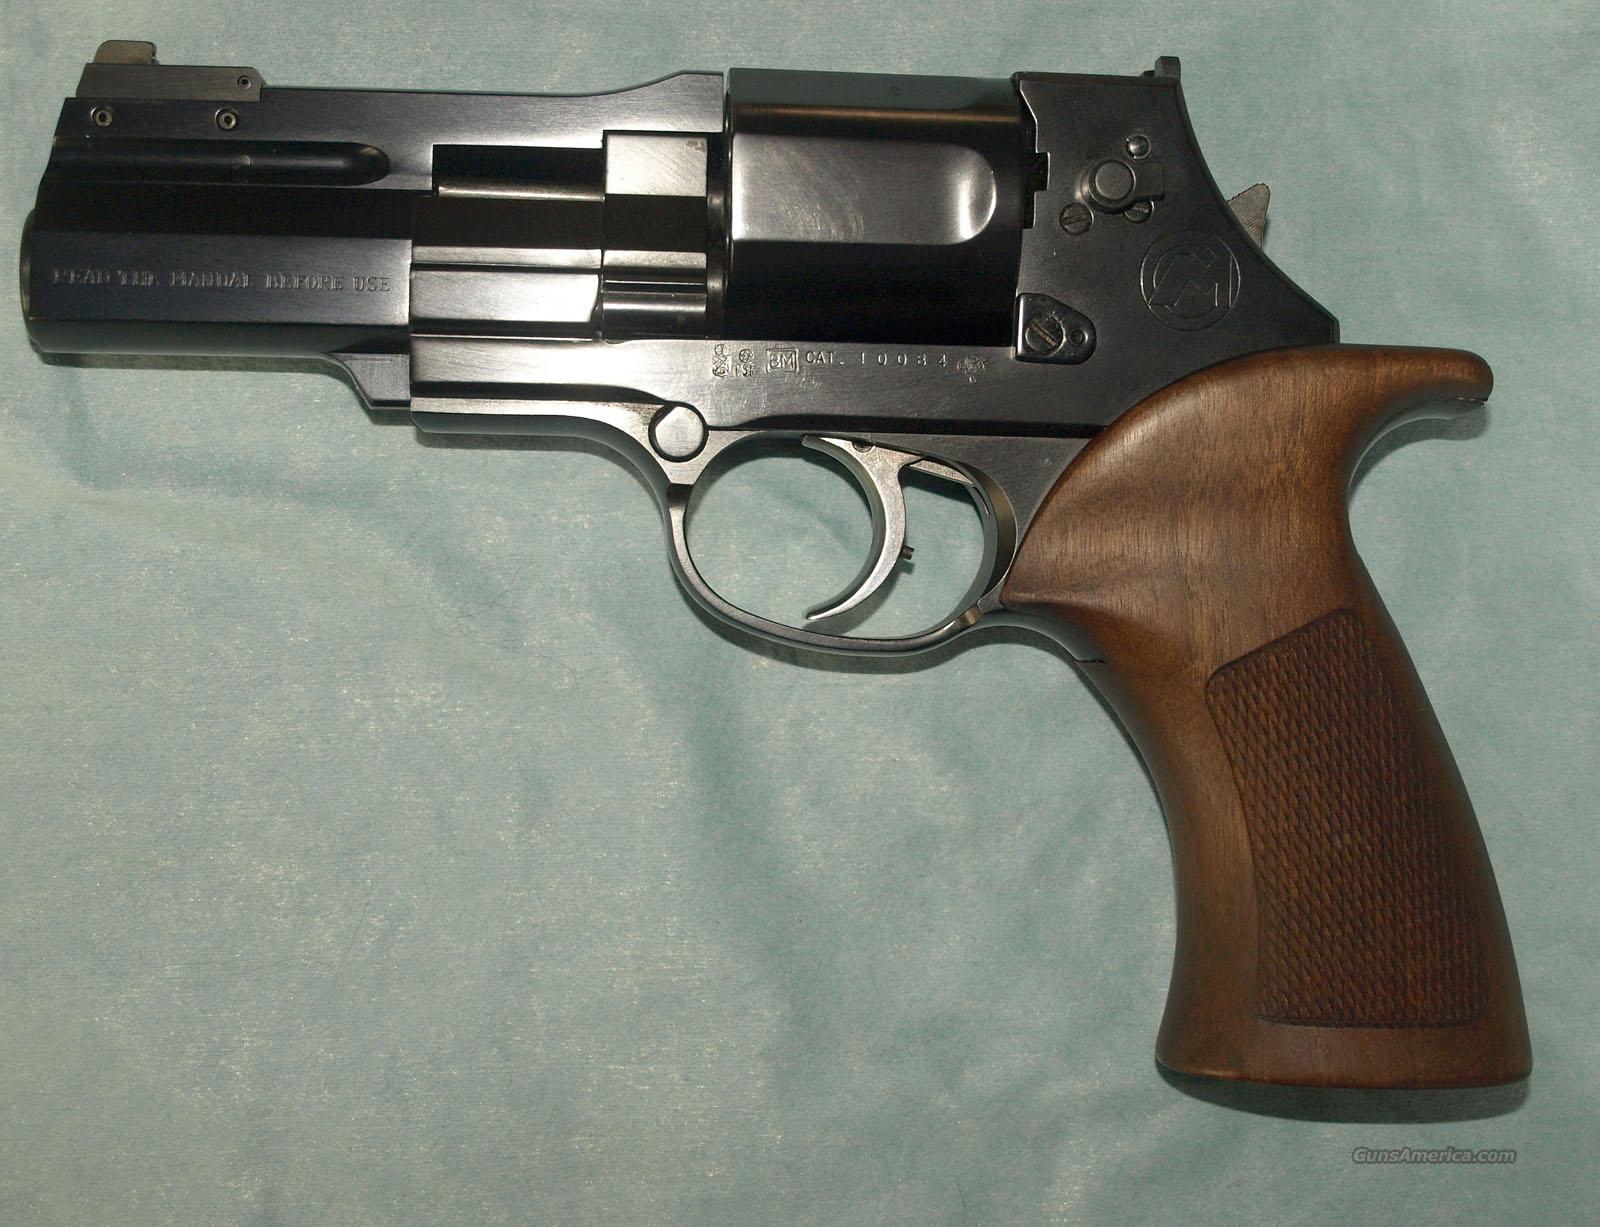 Mateba MTR-8 .38 Special revolver [5393x2674] : GunPorn